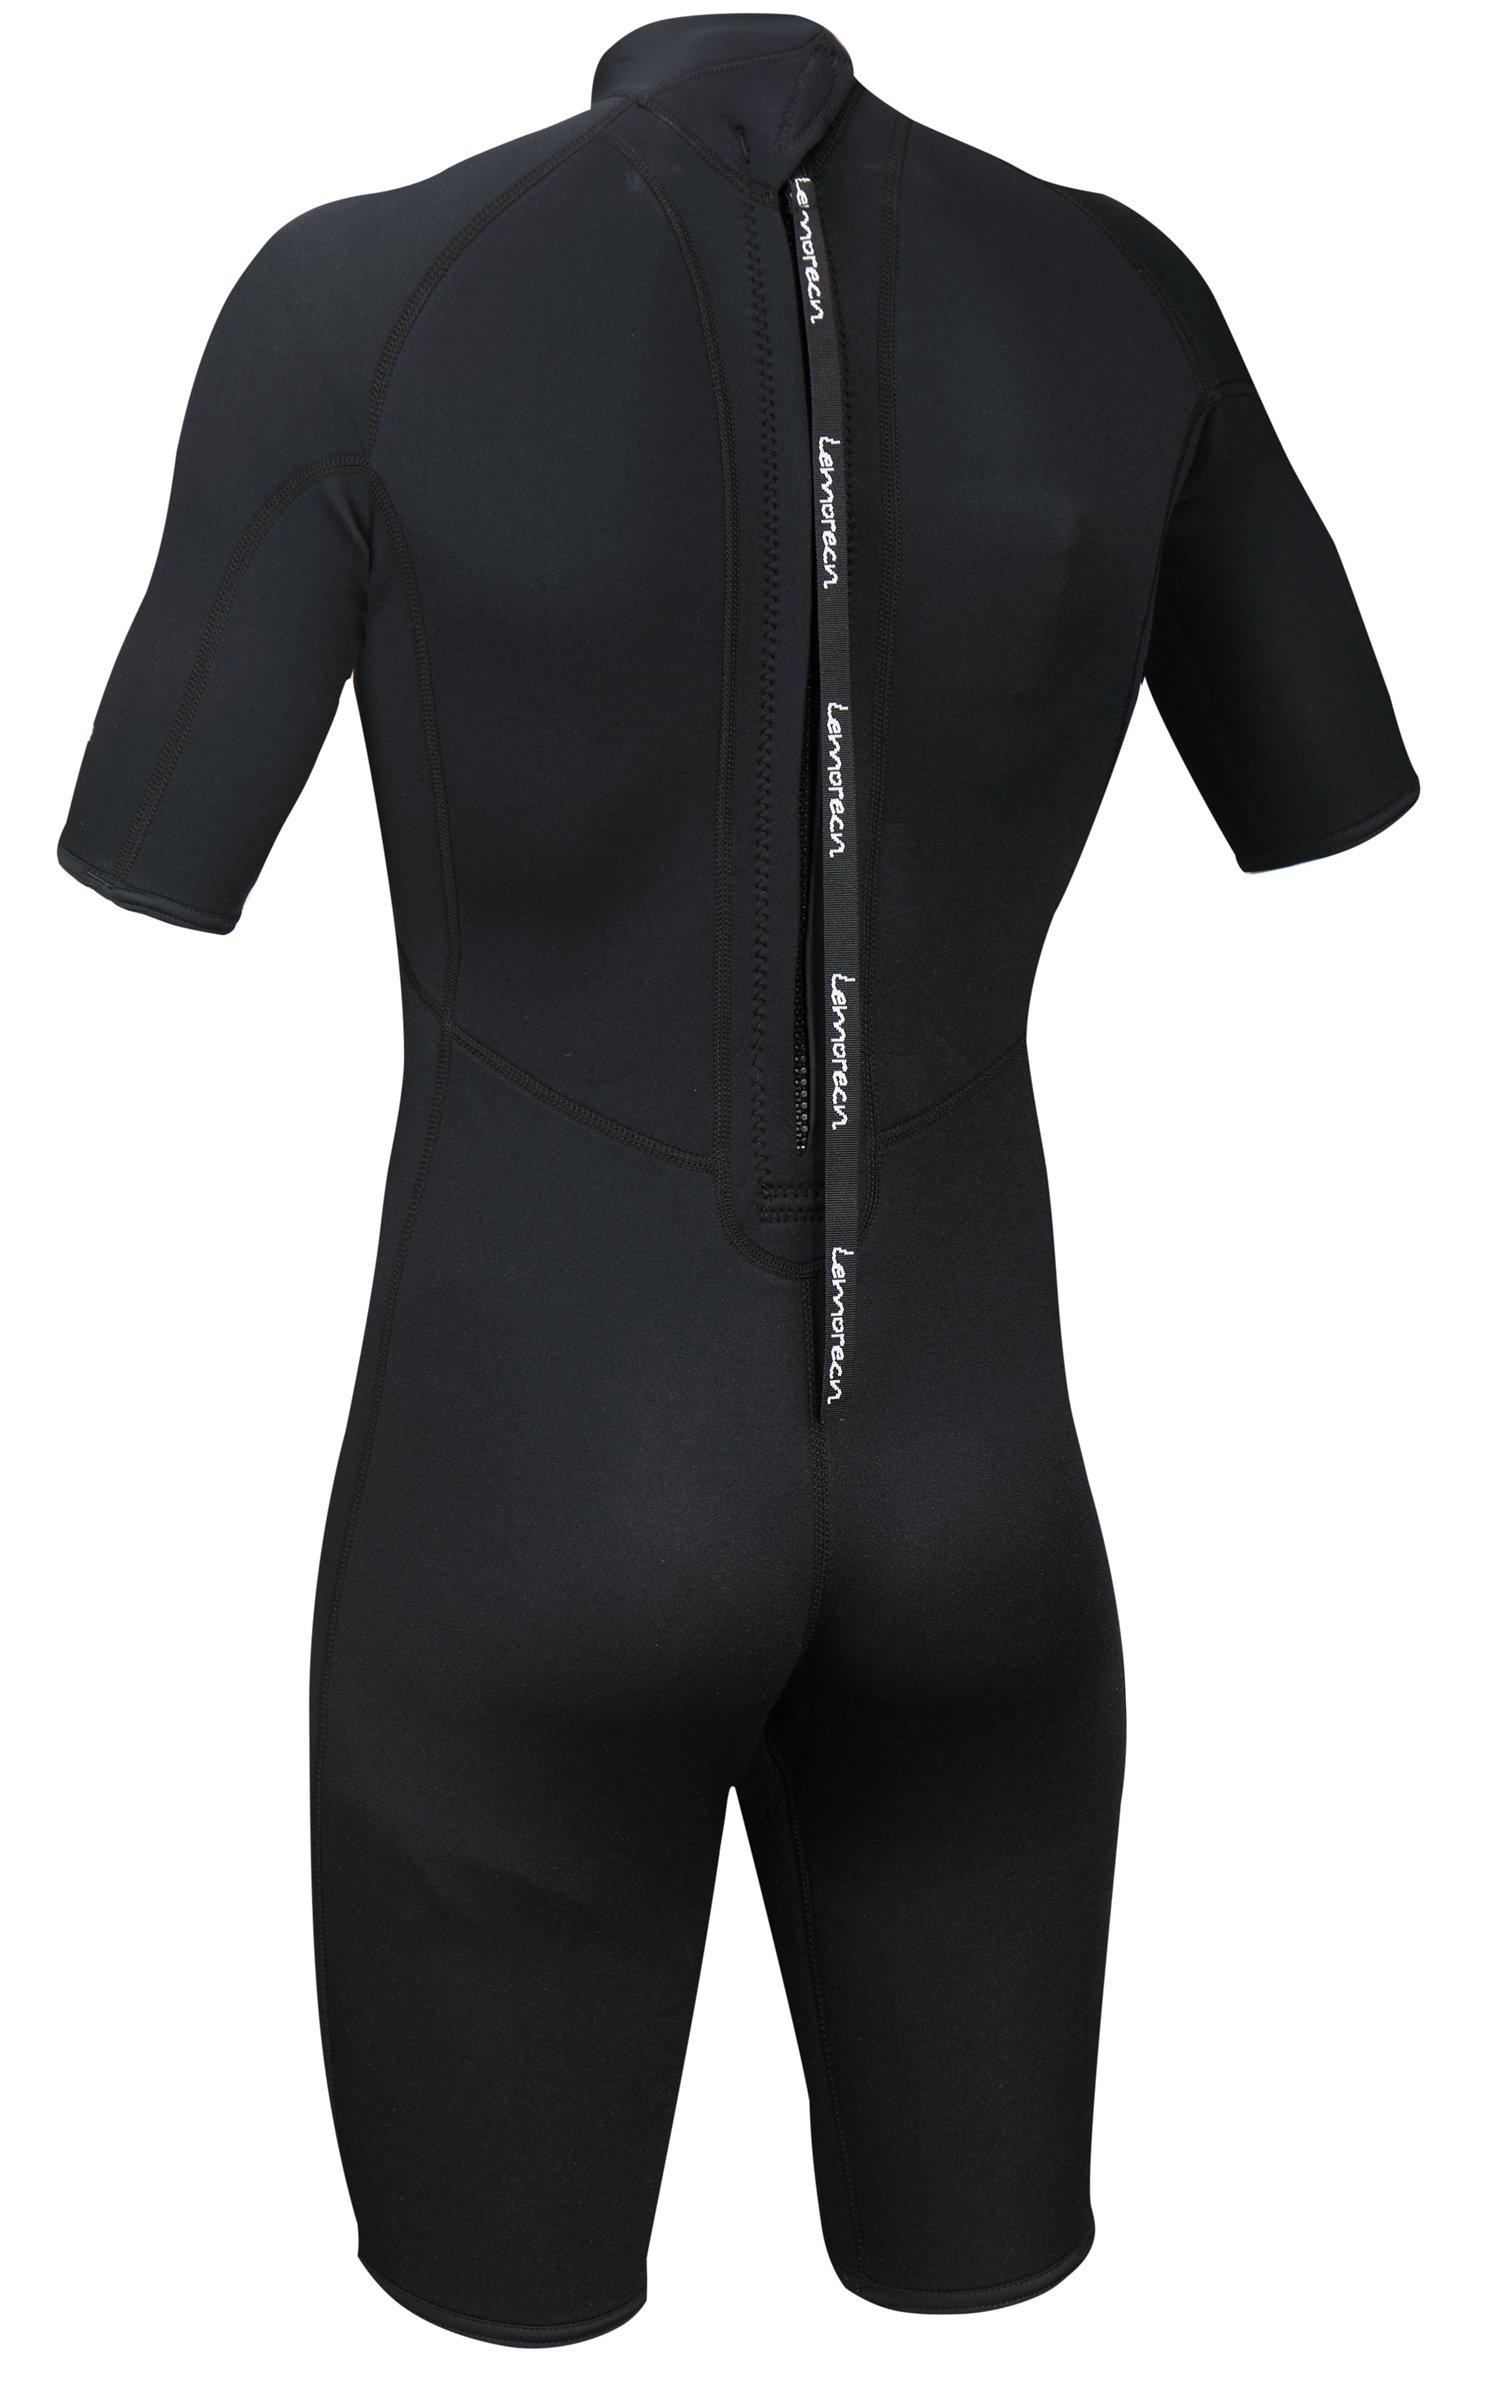 Lemorecn Wetsuits Mens Neoprene 3mm Shorty Diving Suit(3036black-3XL) by Lemorecn (Image #3)